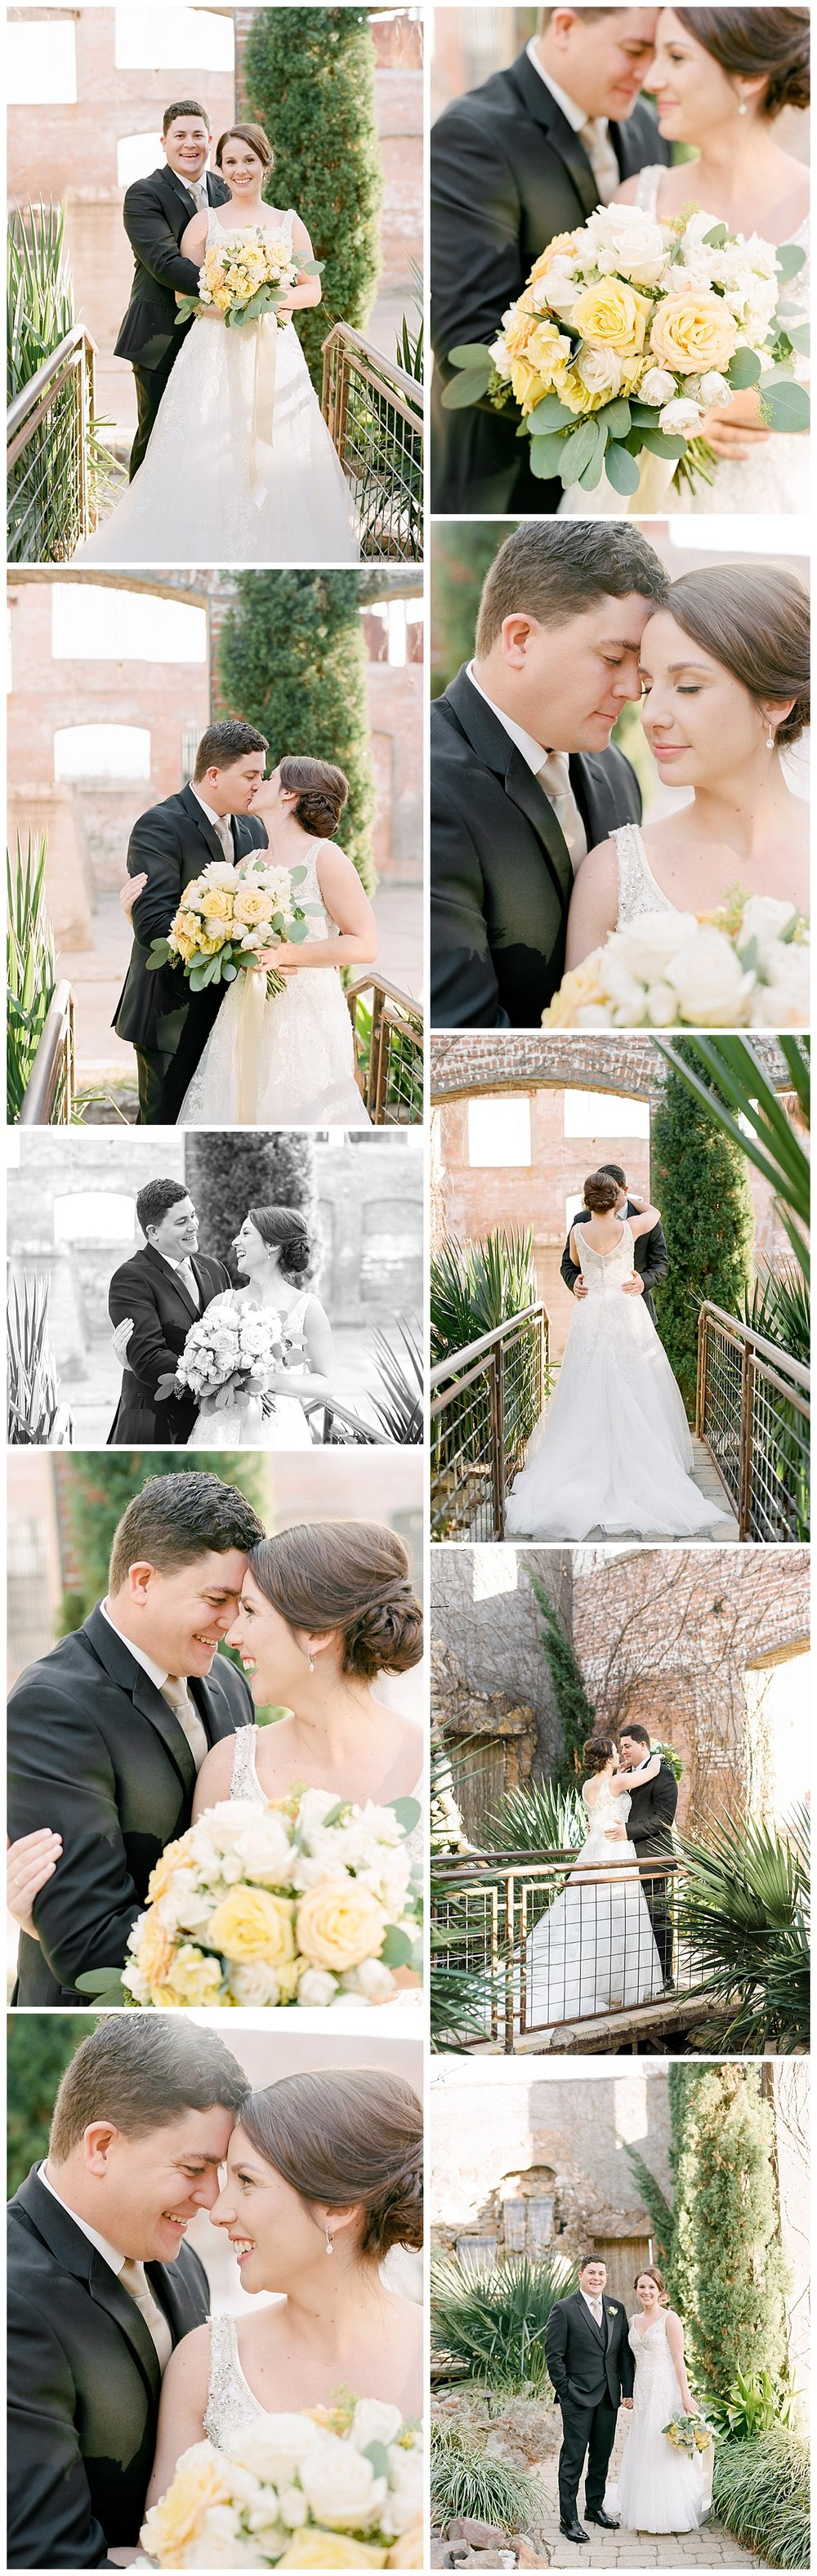 the-cotton-mill-wedding-ar-photography-5.jpg